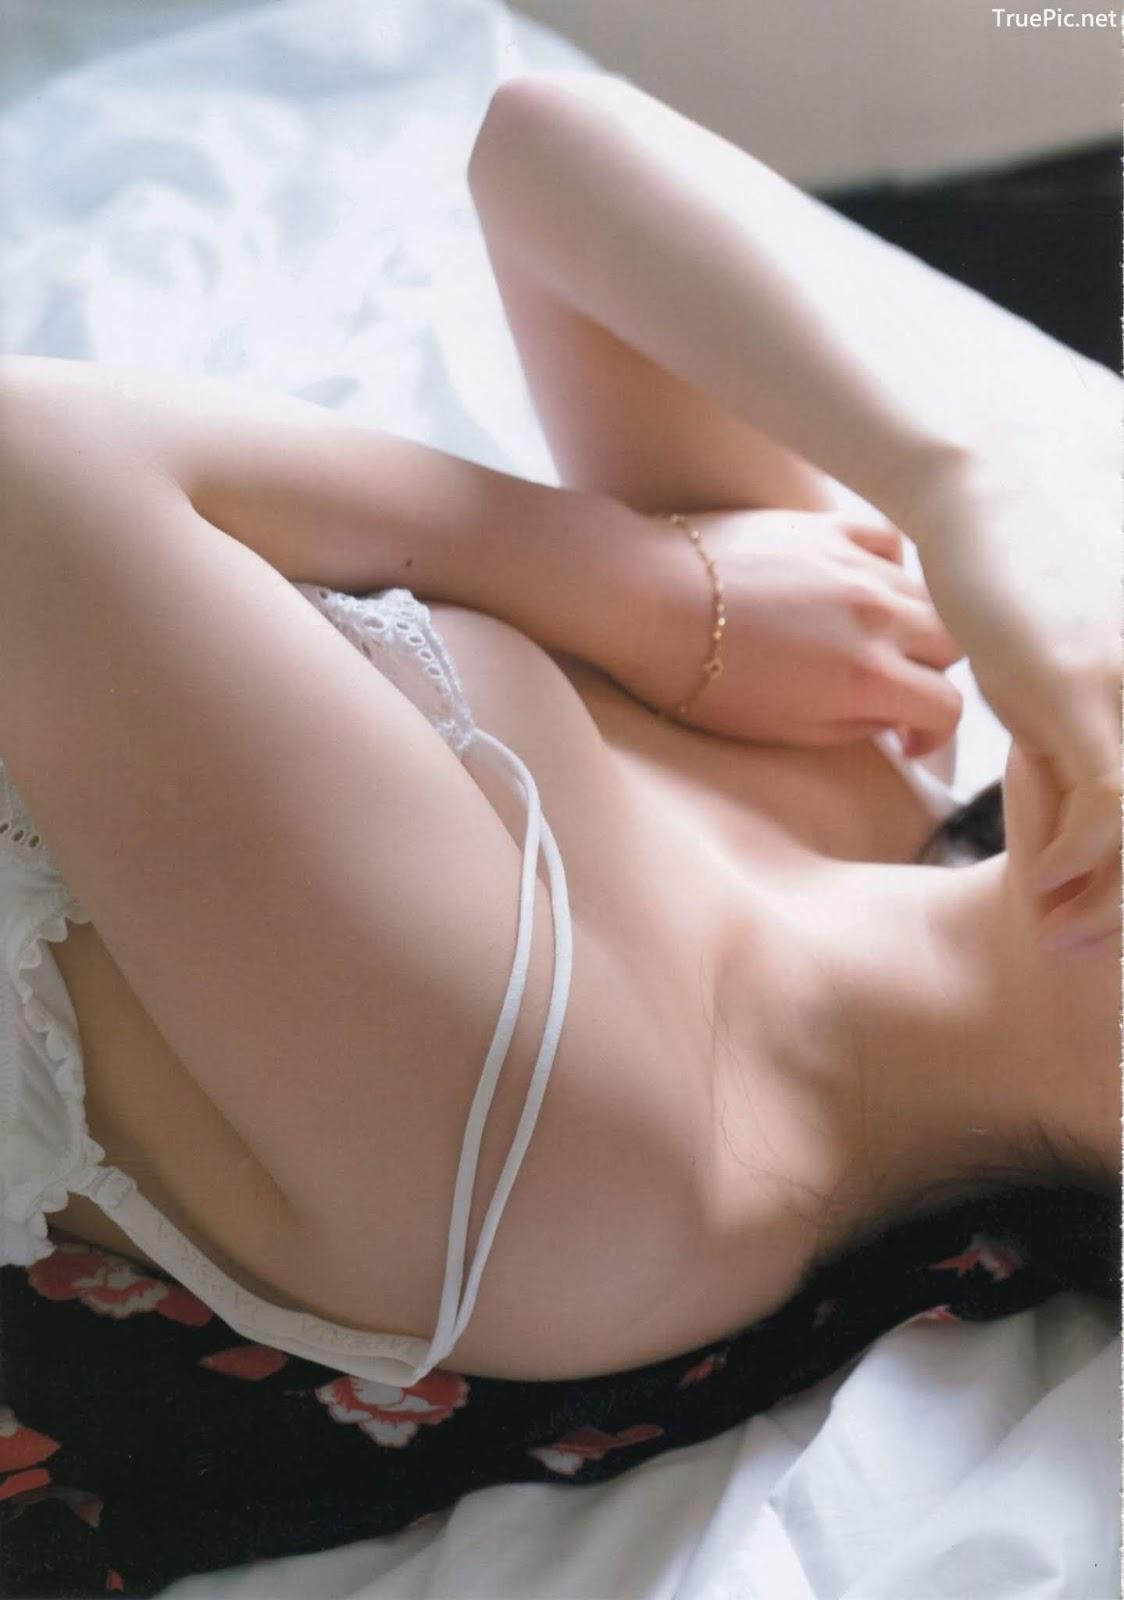 Image Japanese Beauty - Juri Takahashi - Ambiguous Self - TruePic.net - Picture-4